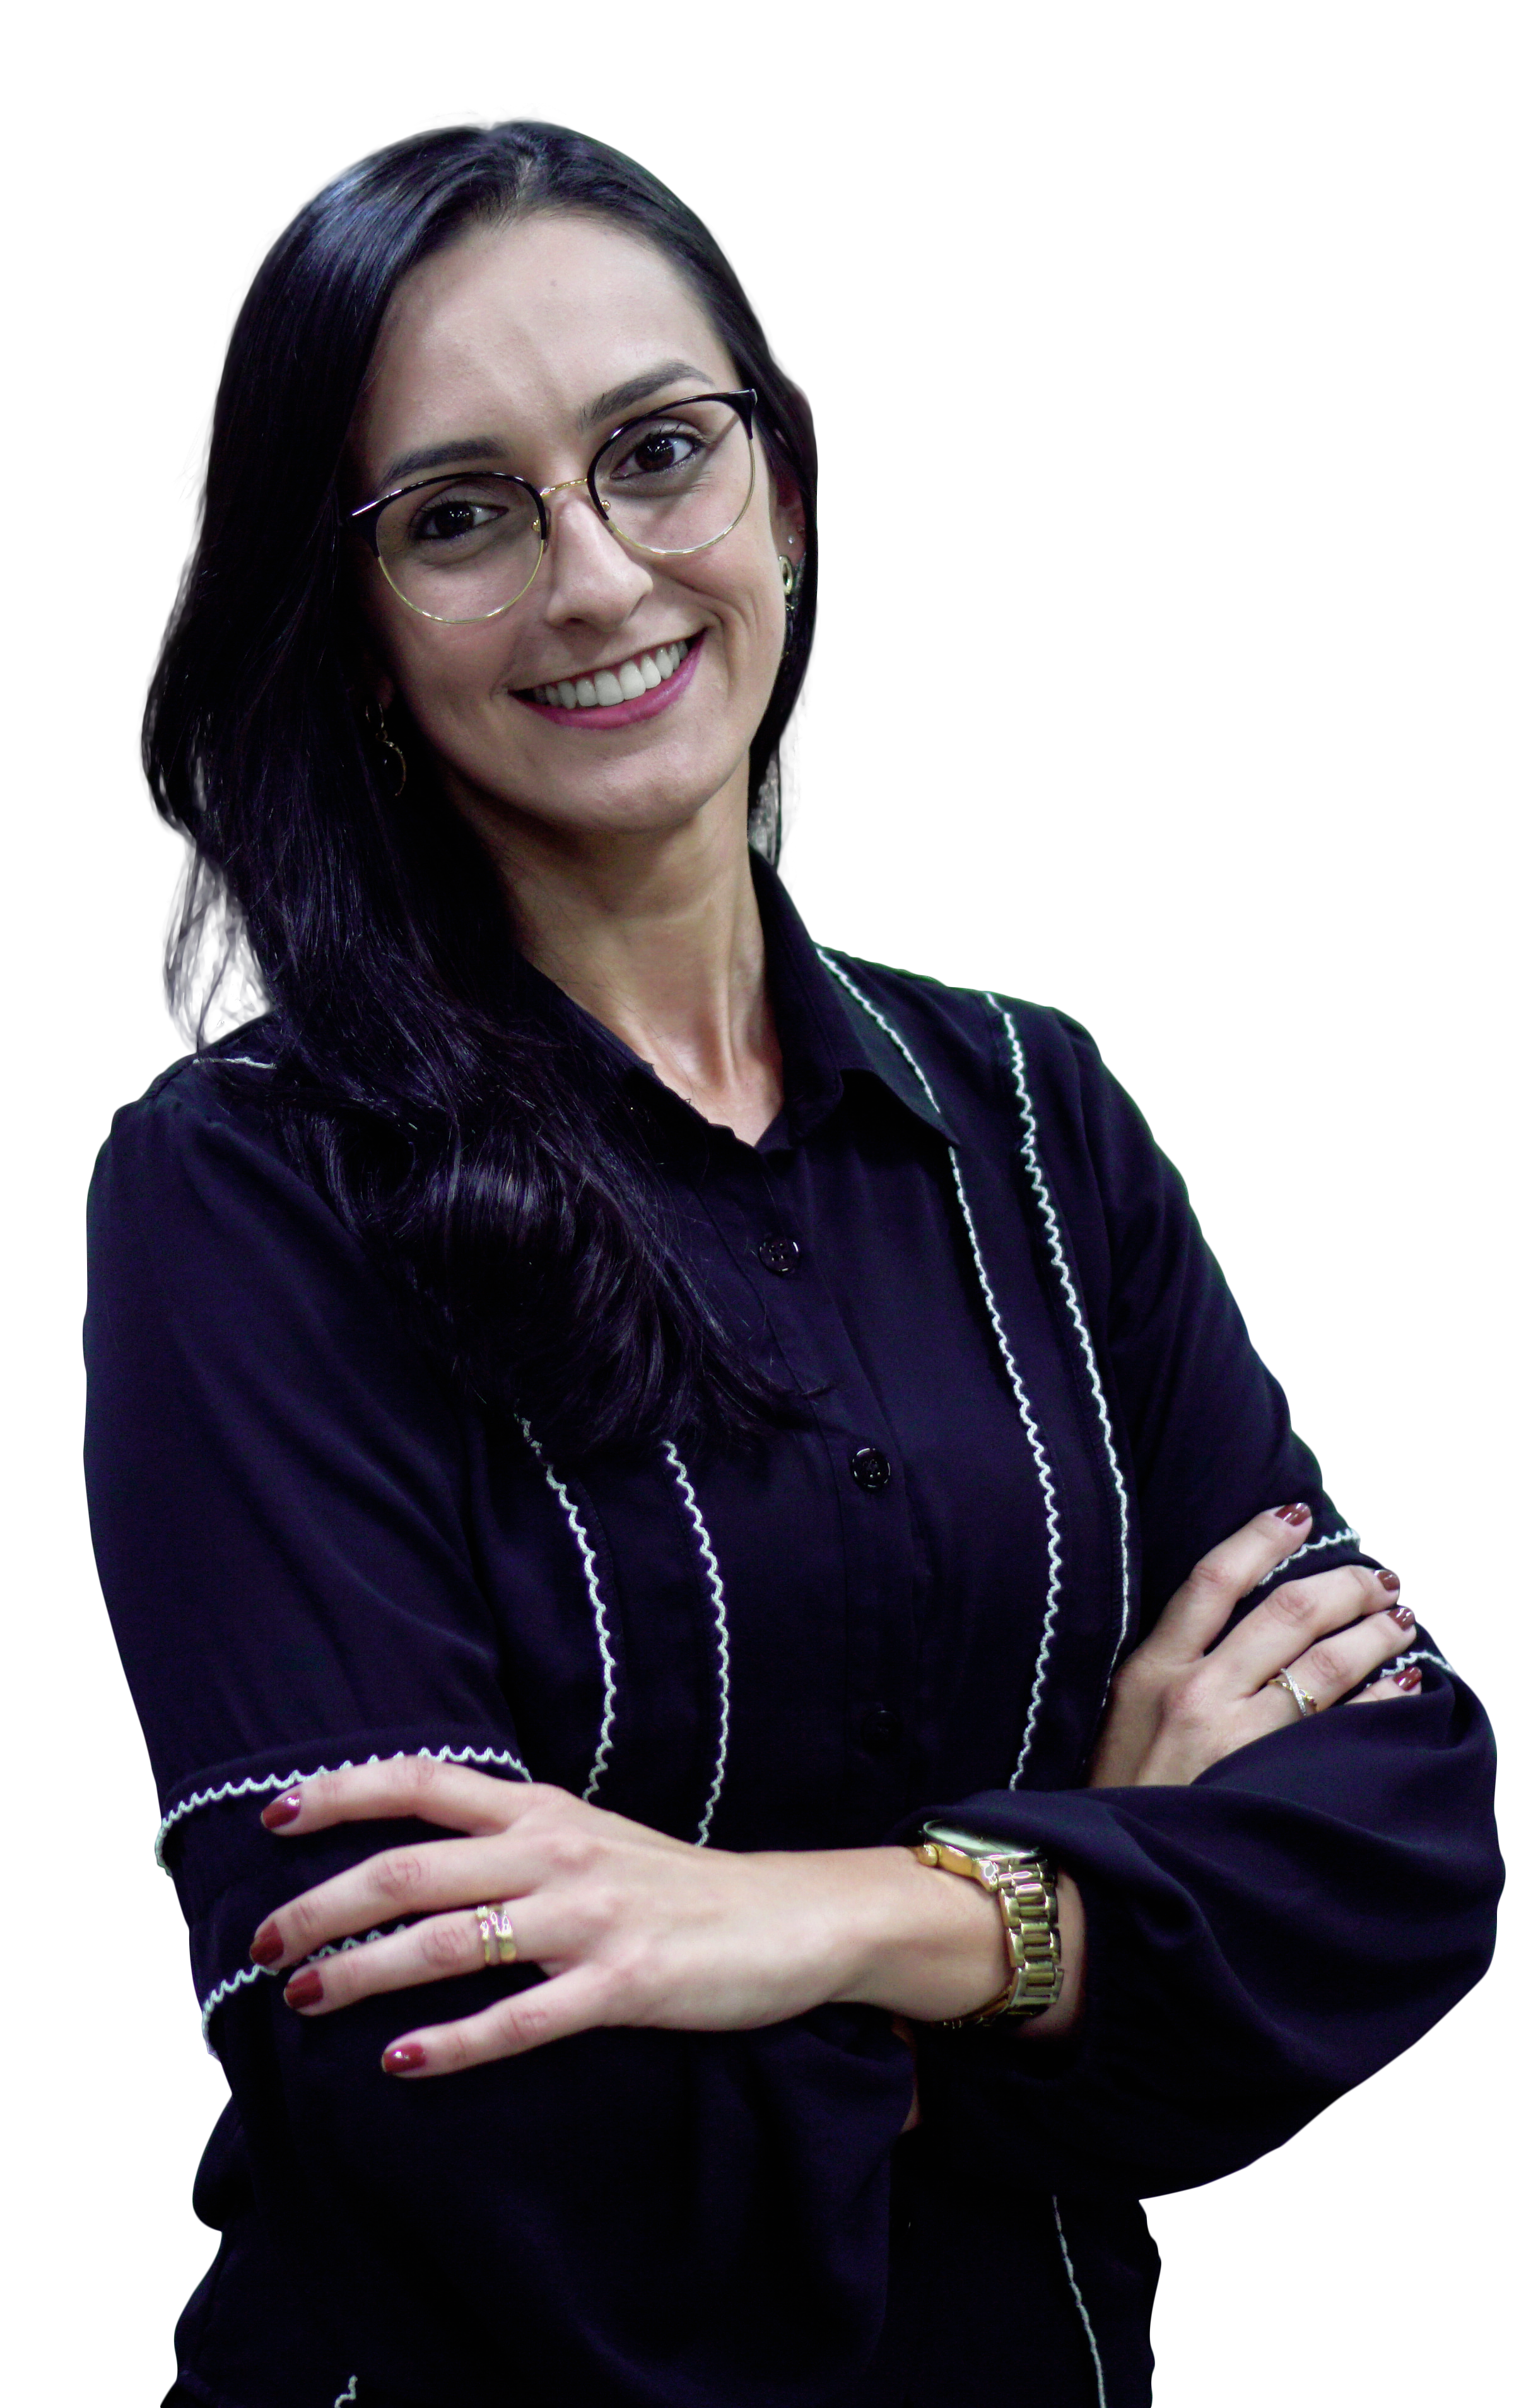 Márcia Almeida Silva